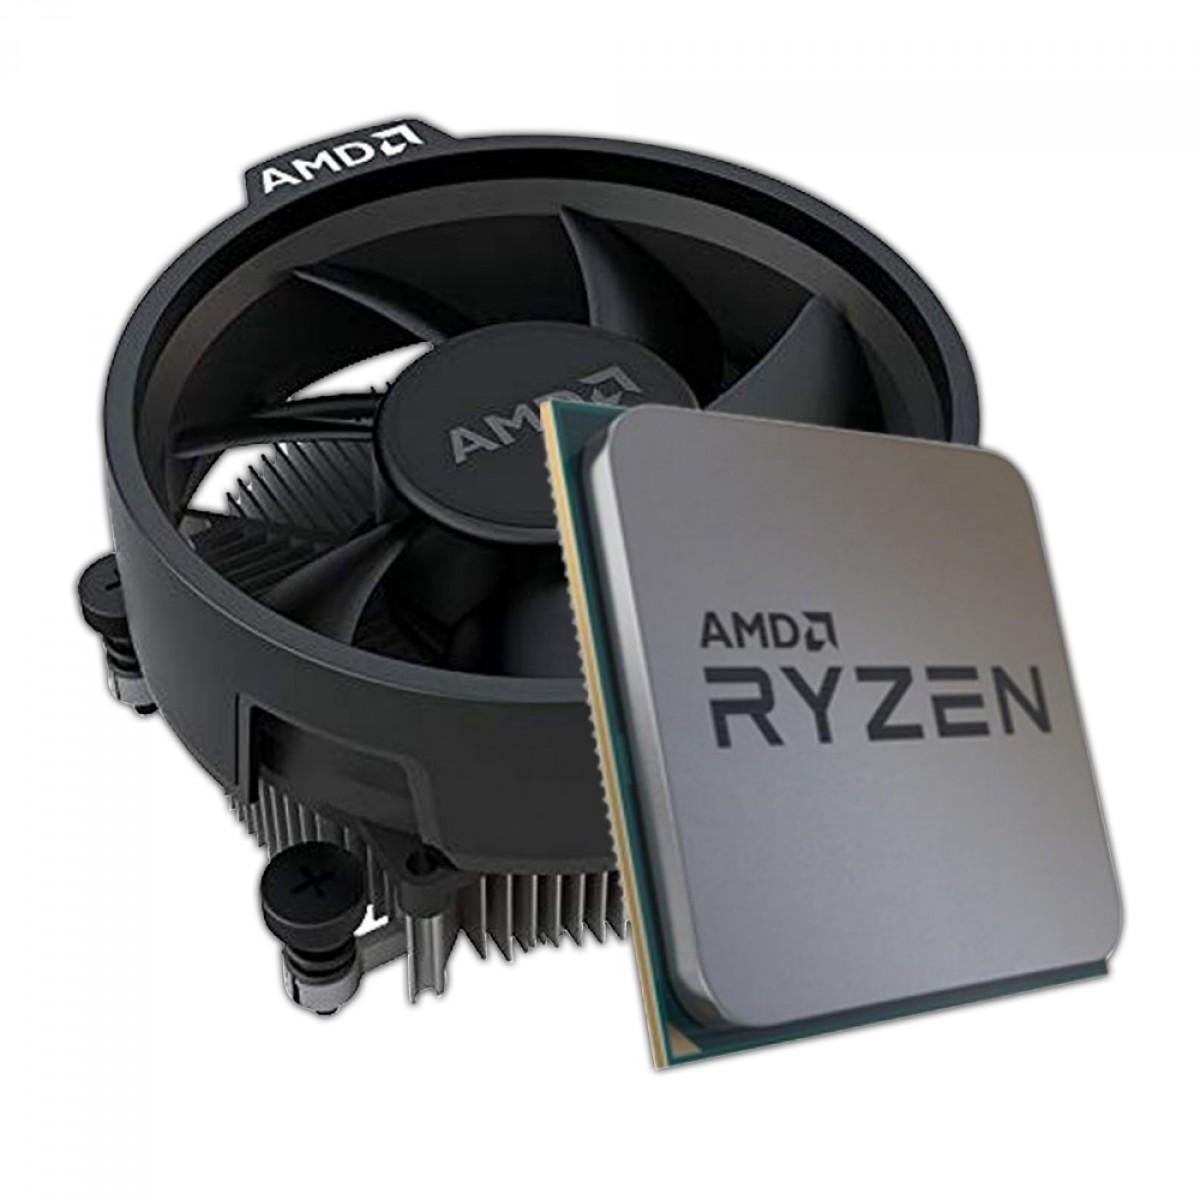 Kit Upgrade GIGABYTE B450M Gaming  + AMD Ryzen 5 3400G 3.7GHz